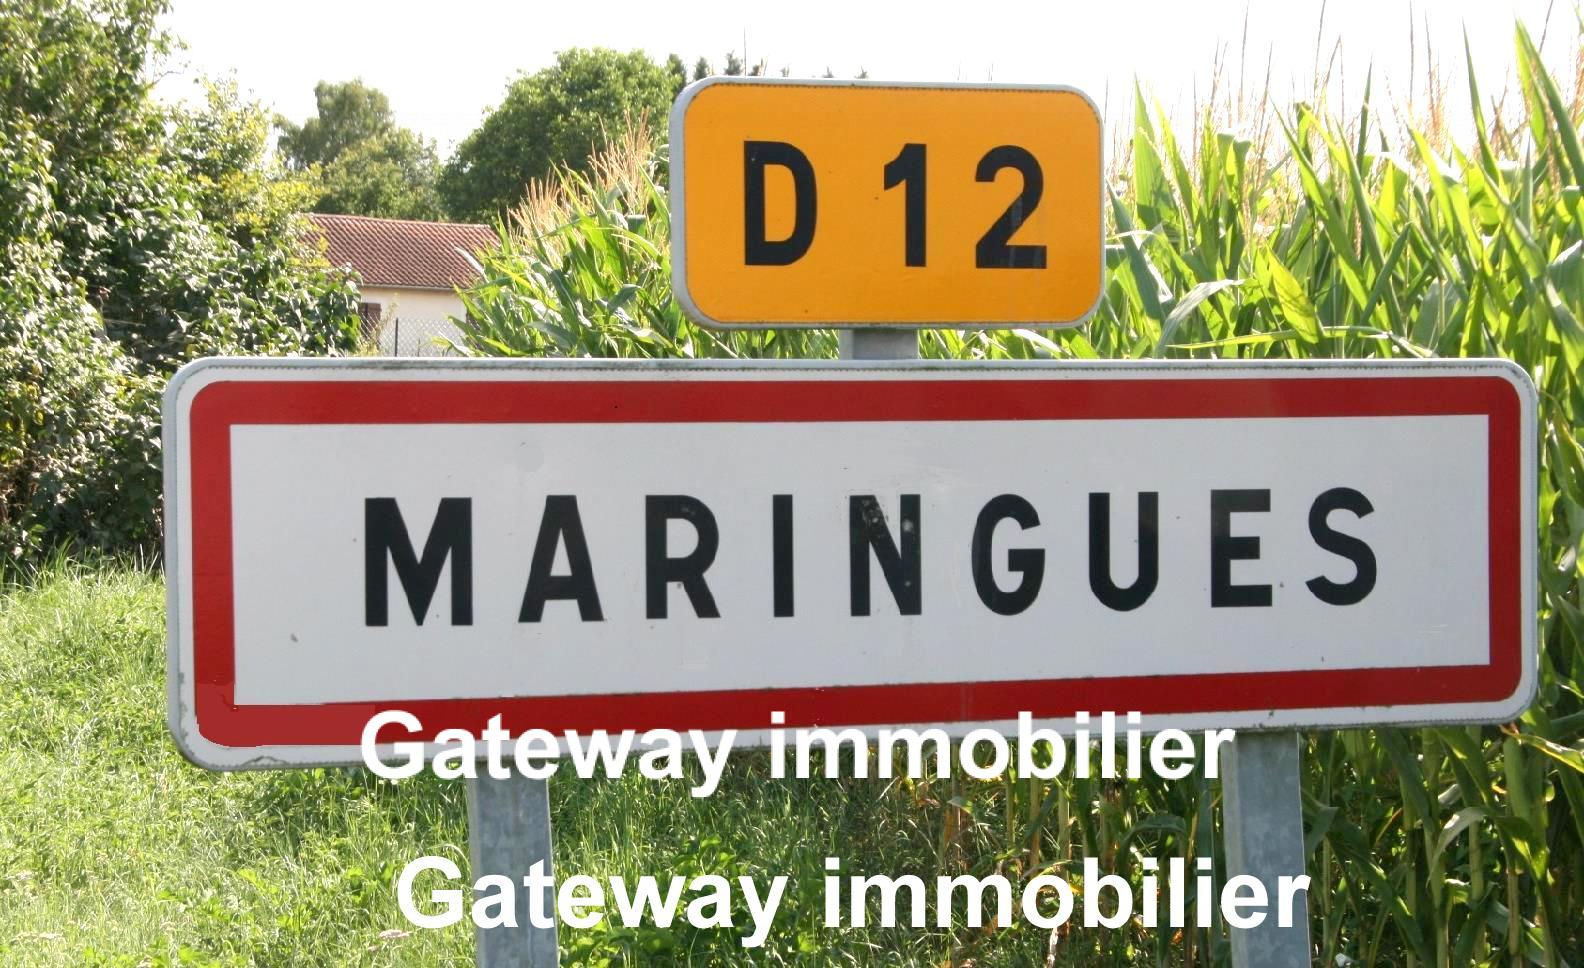 Vente terrain constructible de 1797 m2 a maringues for Prix du m2 non constructible